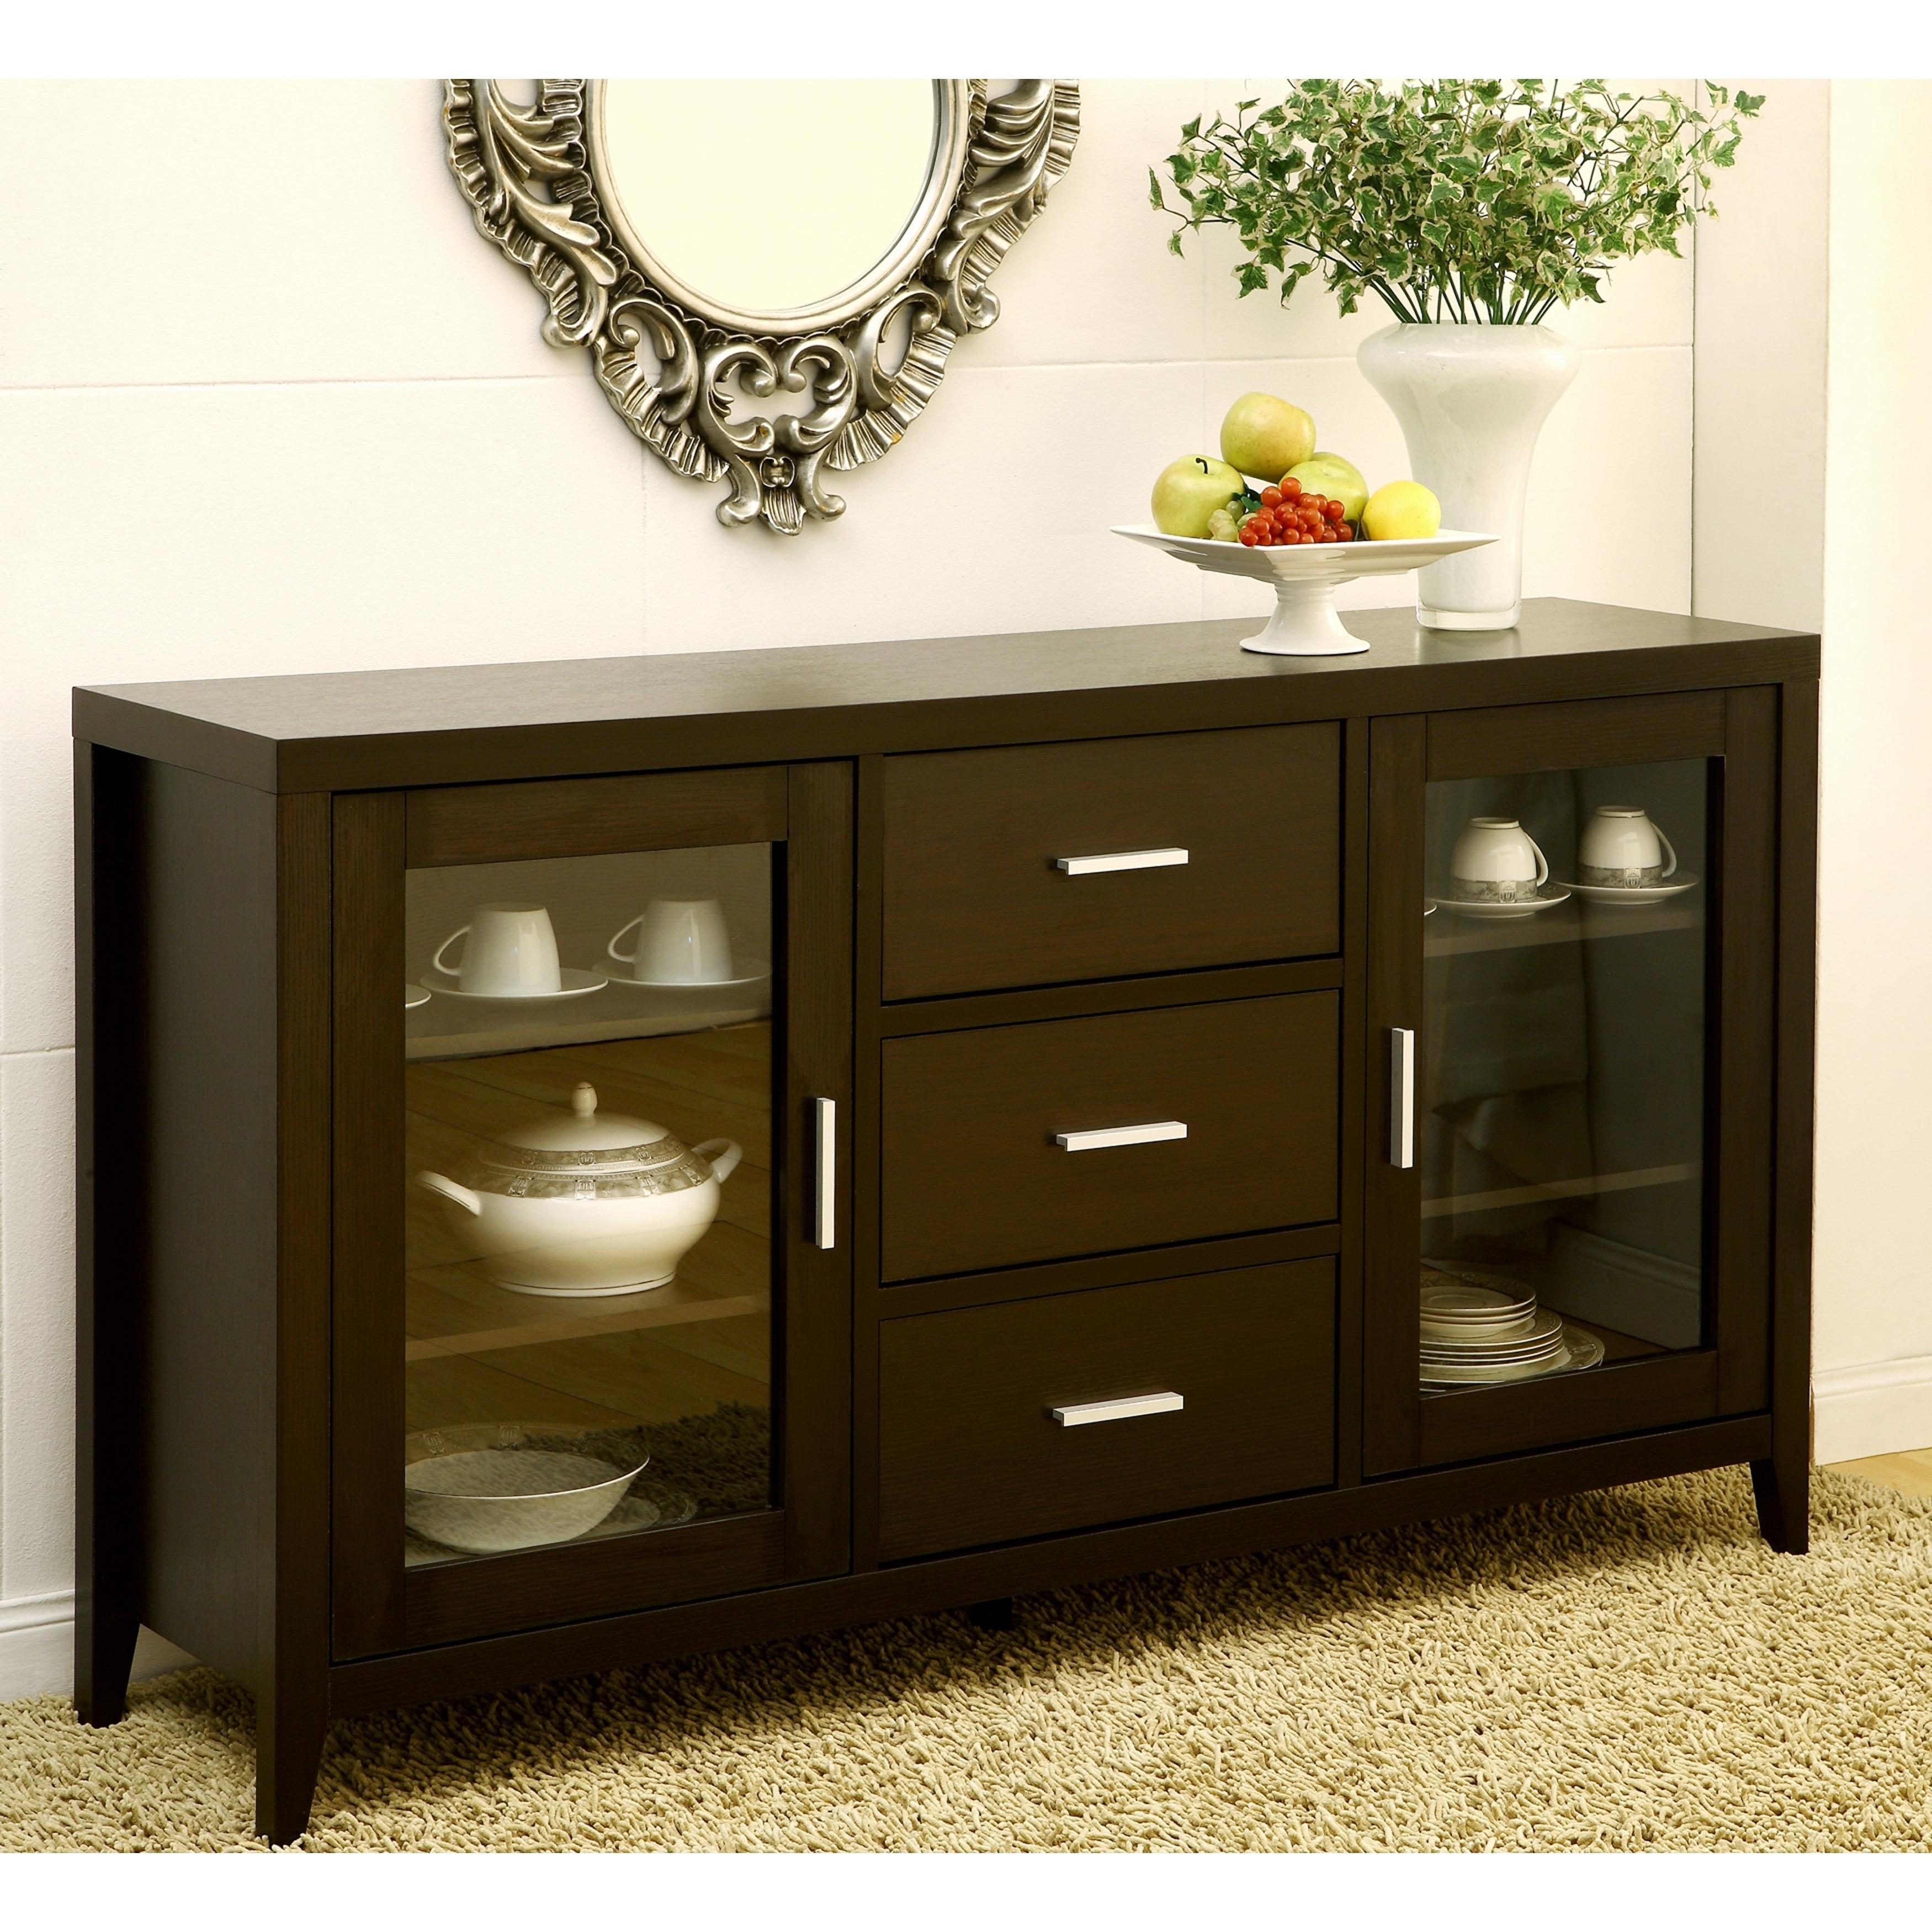 Furniture of America Metropolitan Dining Buffet/TV Cabine...